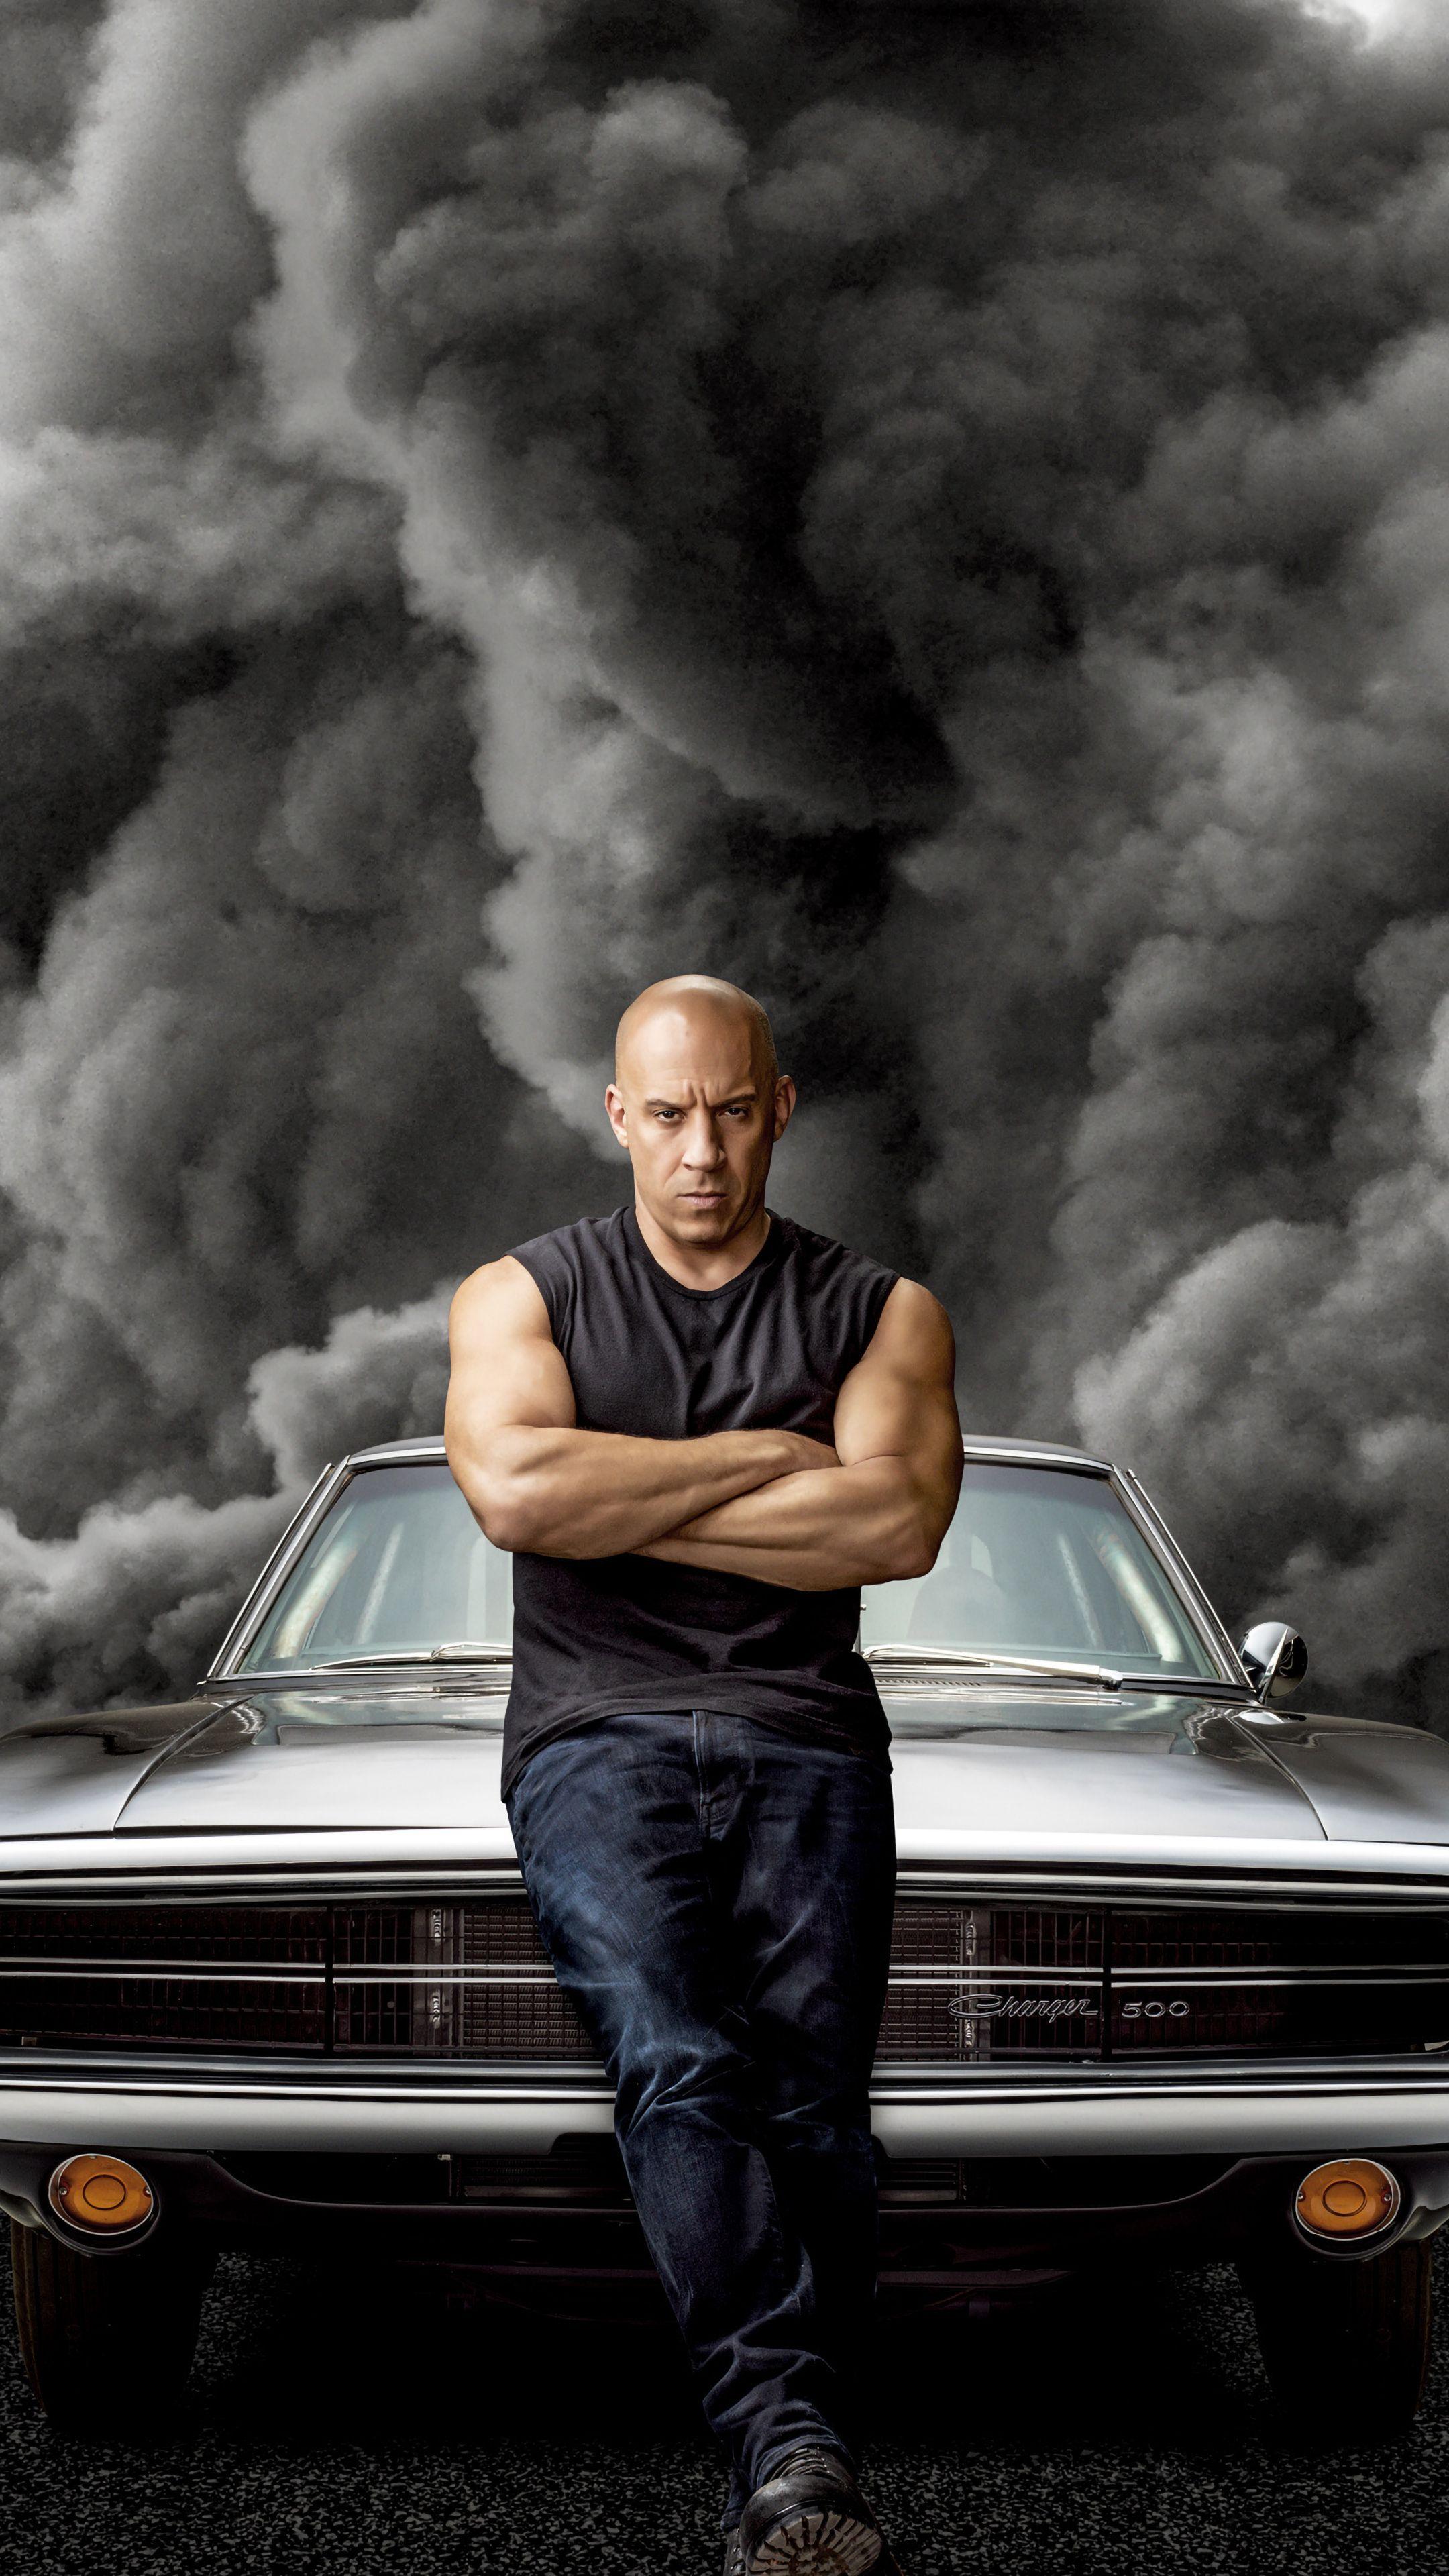 2160x3840 Vin Diesel Fast Furious 9 Movie Wallpaper In 2020 Movie Fast And Furious Fast And Furious Action Movie Poster